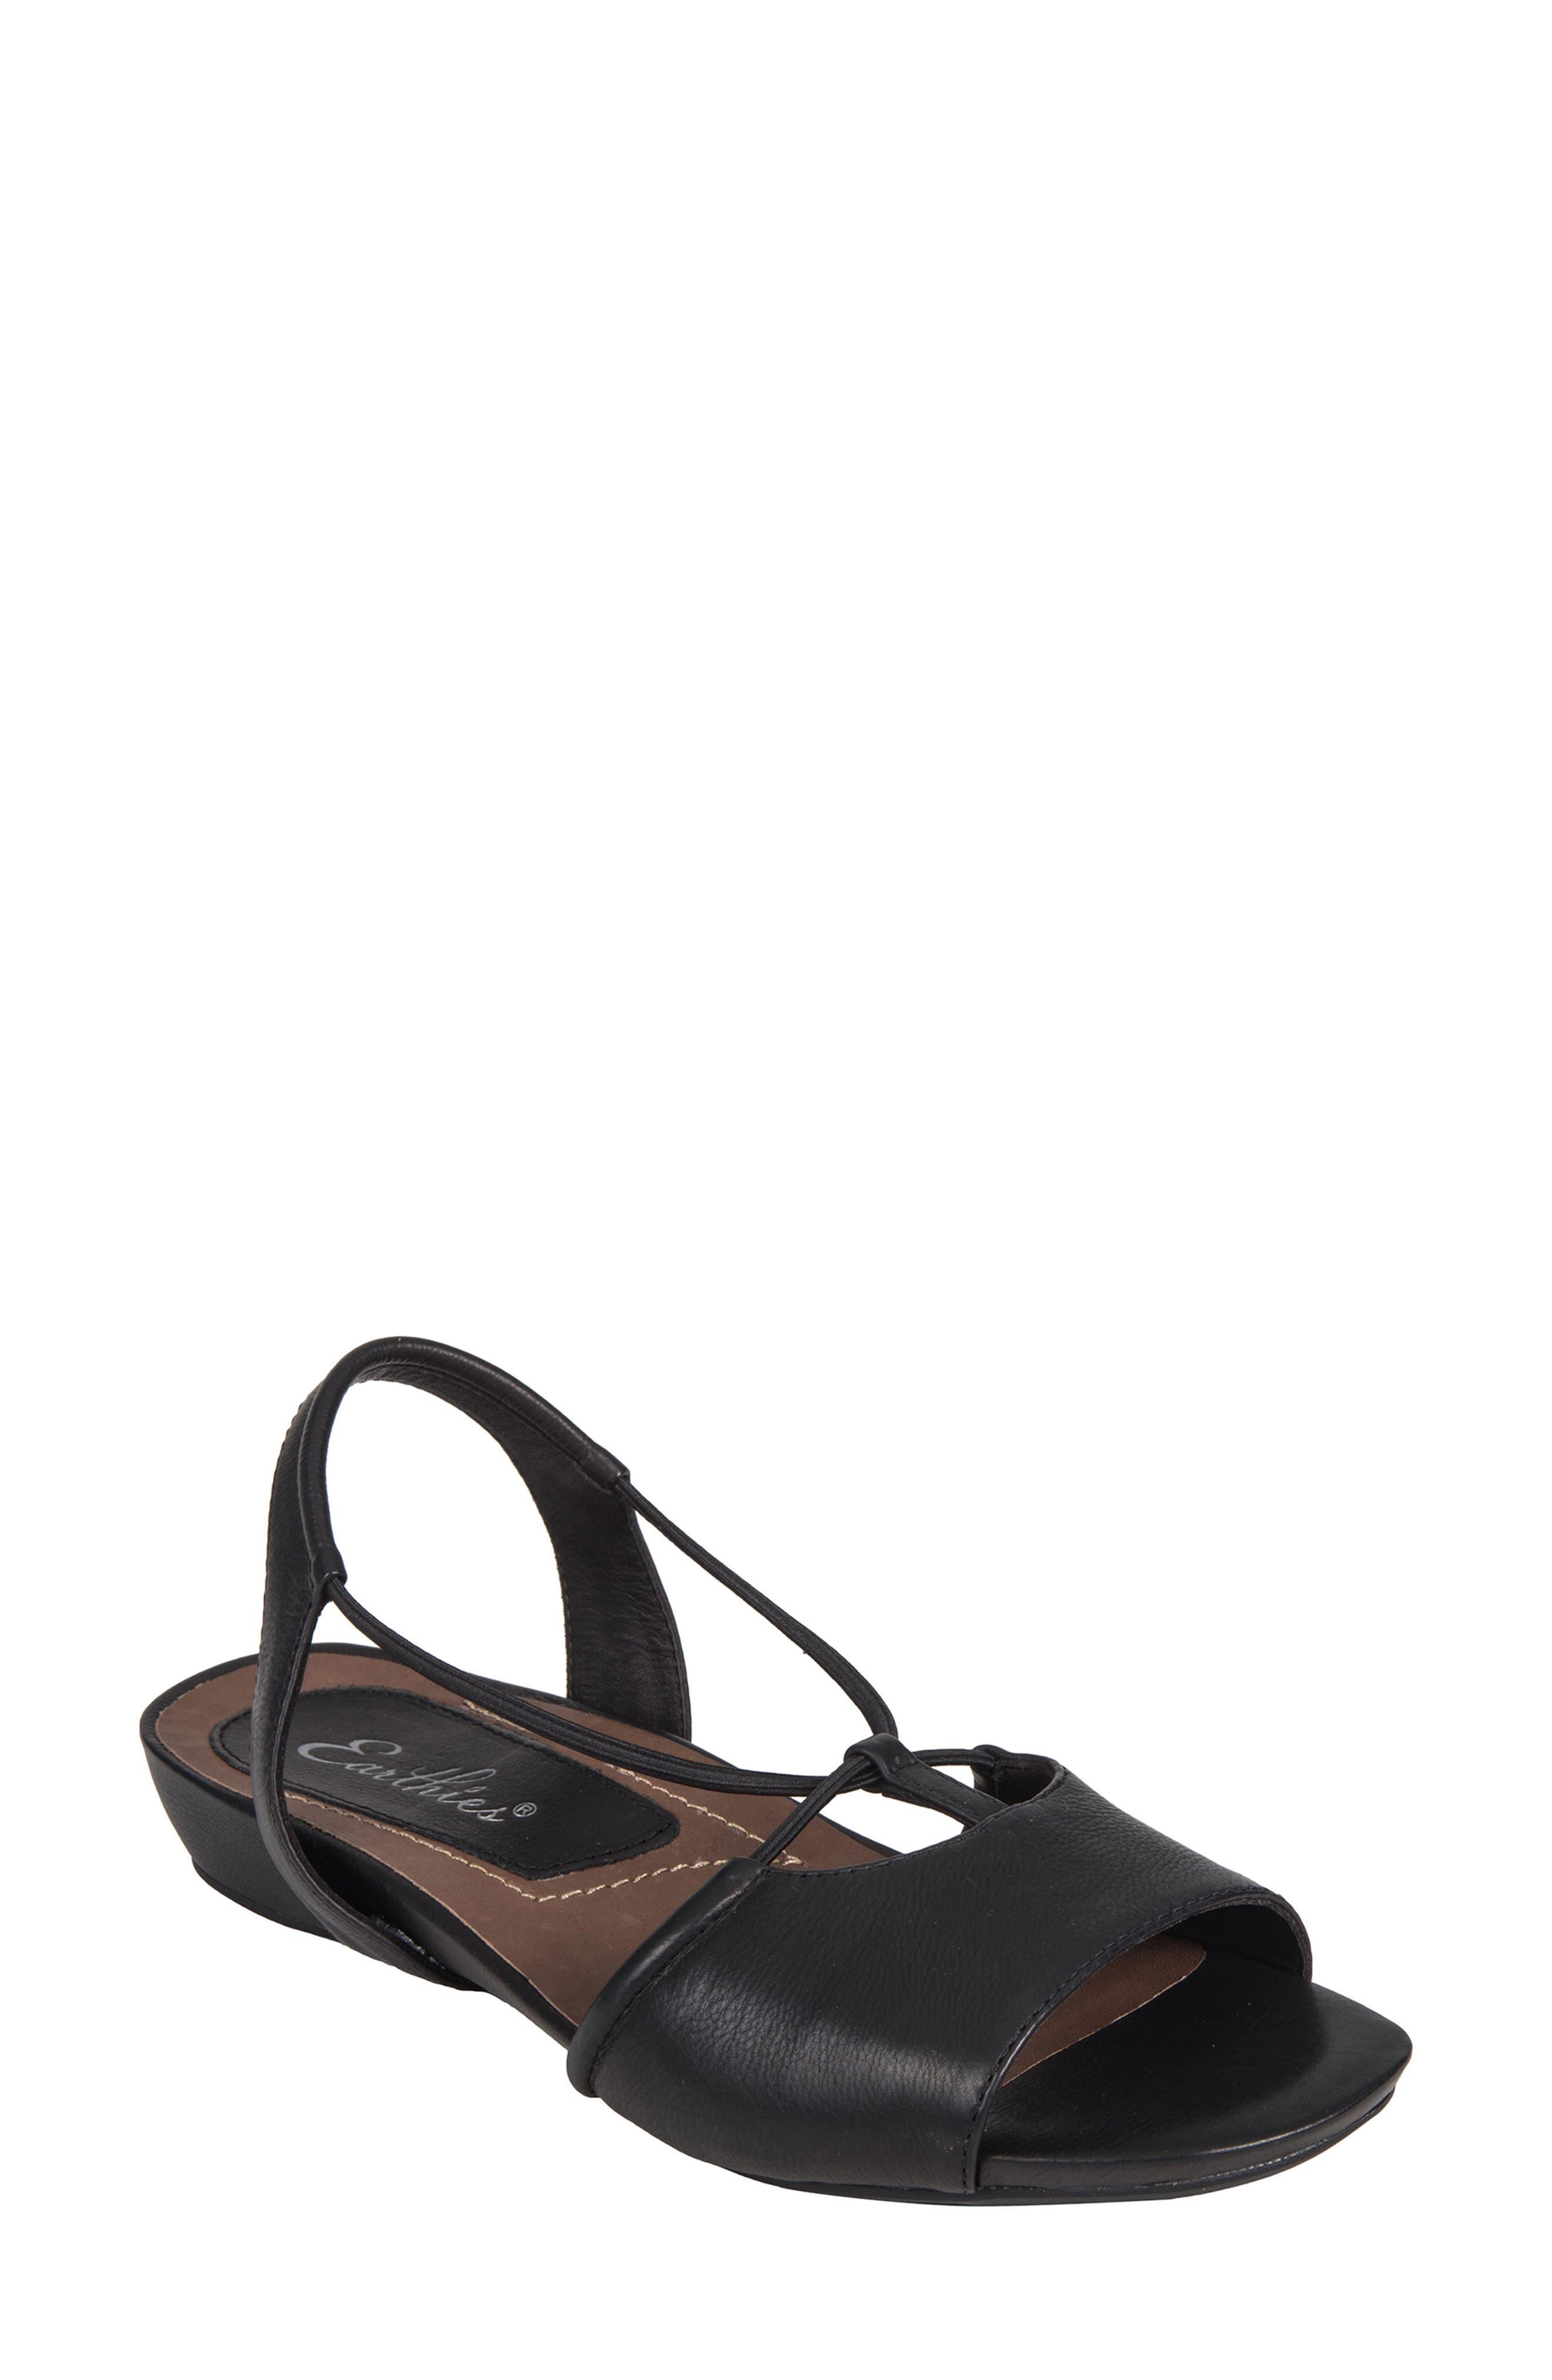 Lacona Sandal,                         Main,                         color, BLACK LEATHER